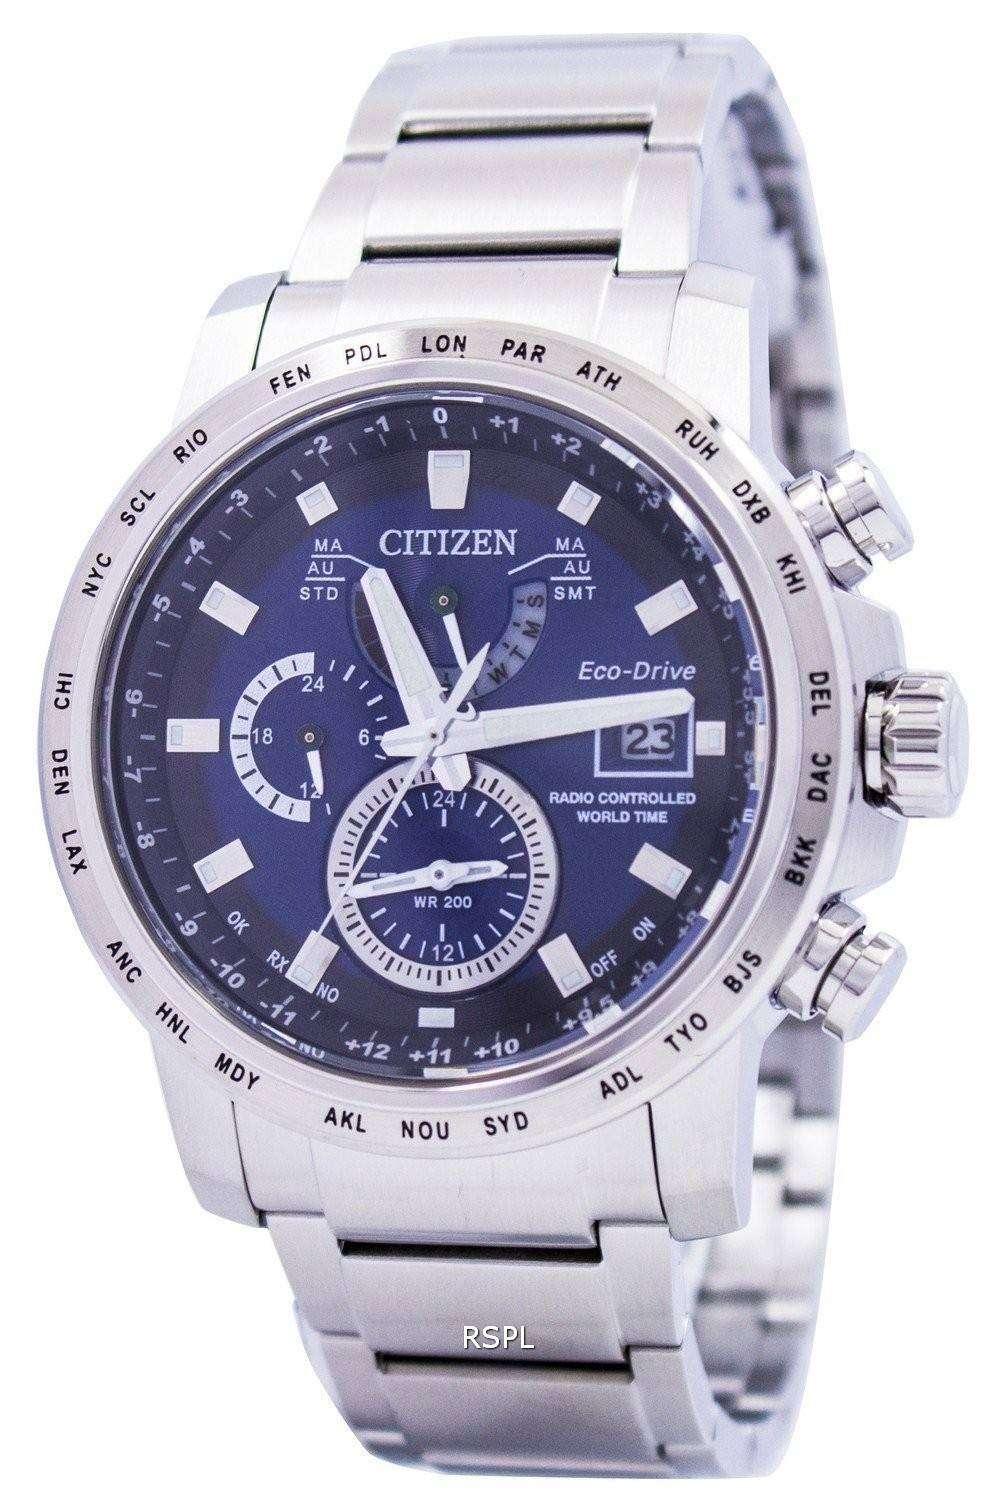 Atomic watch collection - Casio atomic watches - Casio ...